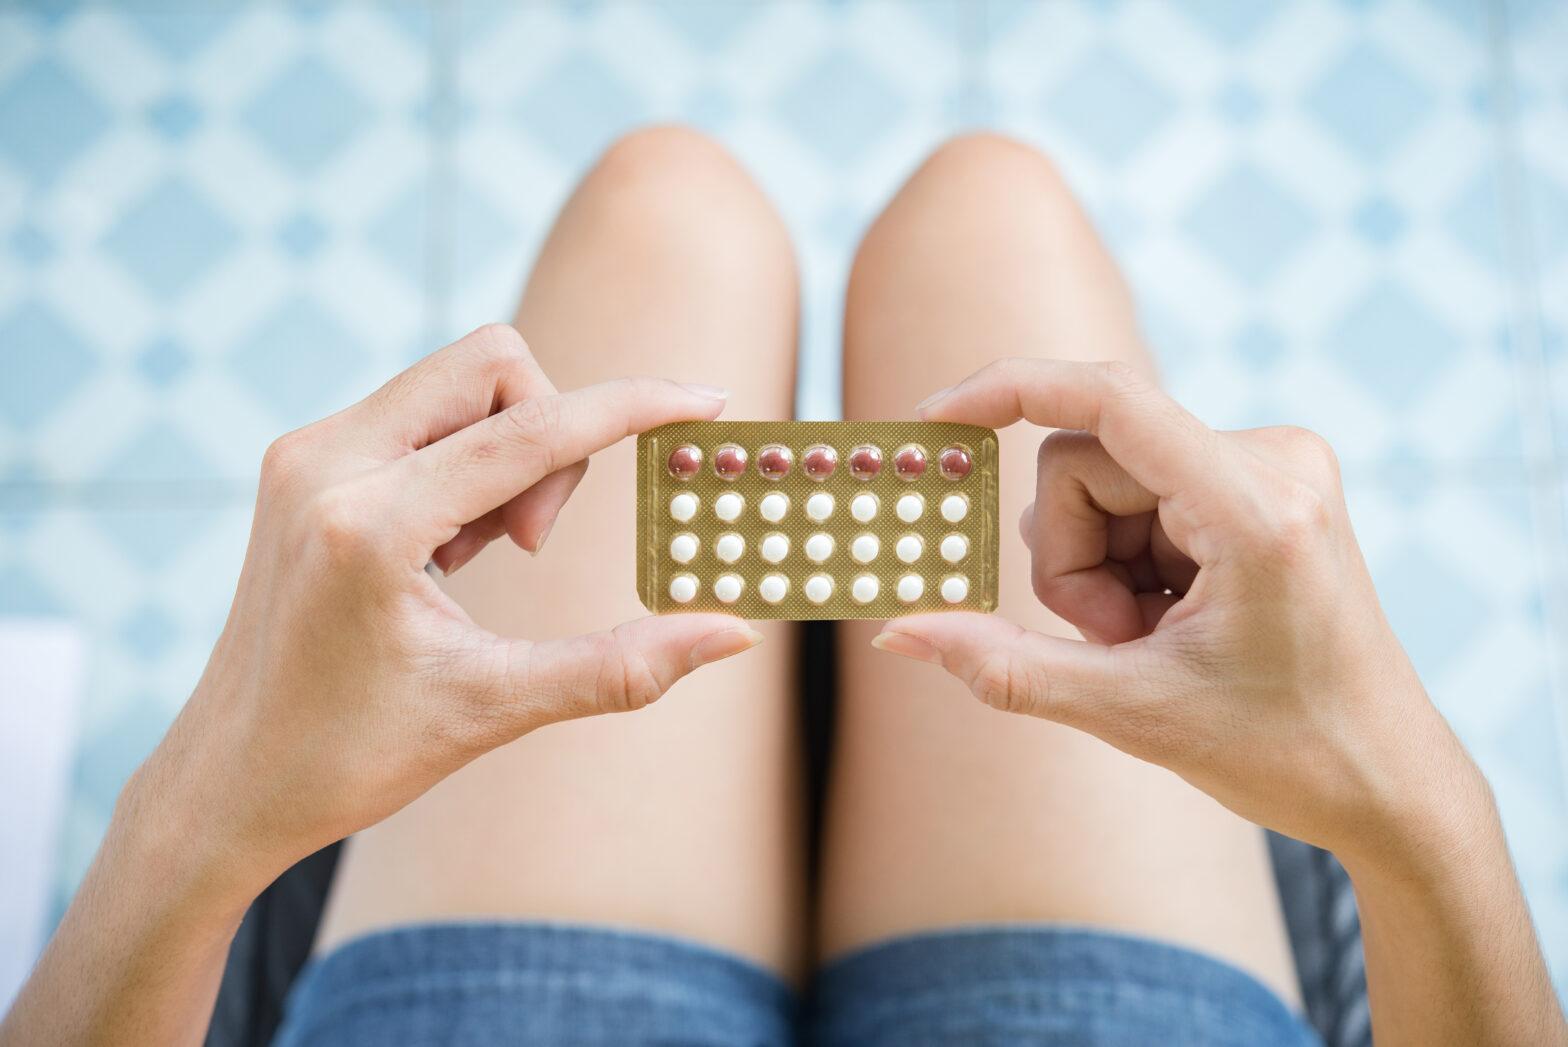 anticonceptivos para mujer femeninos ginecologos equipo ayud